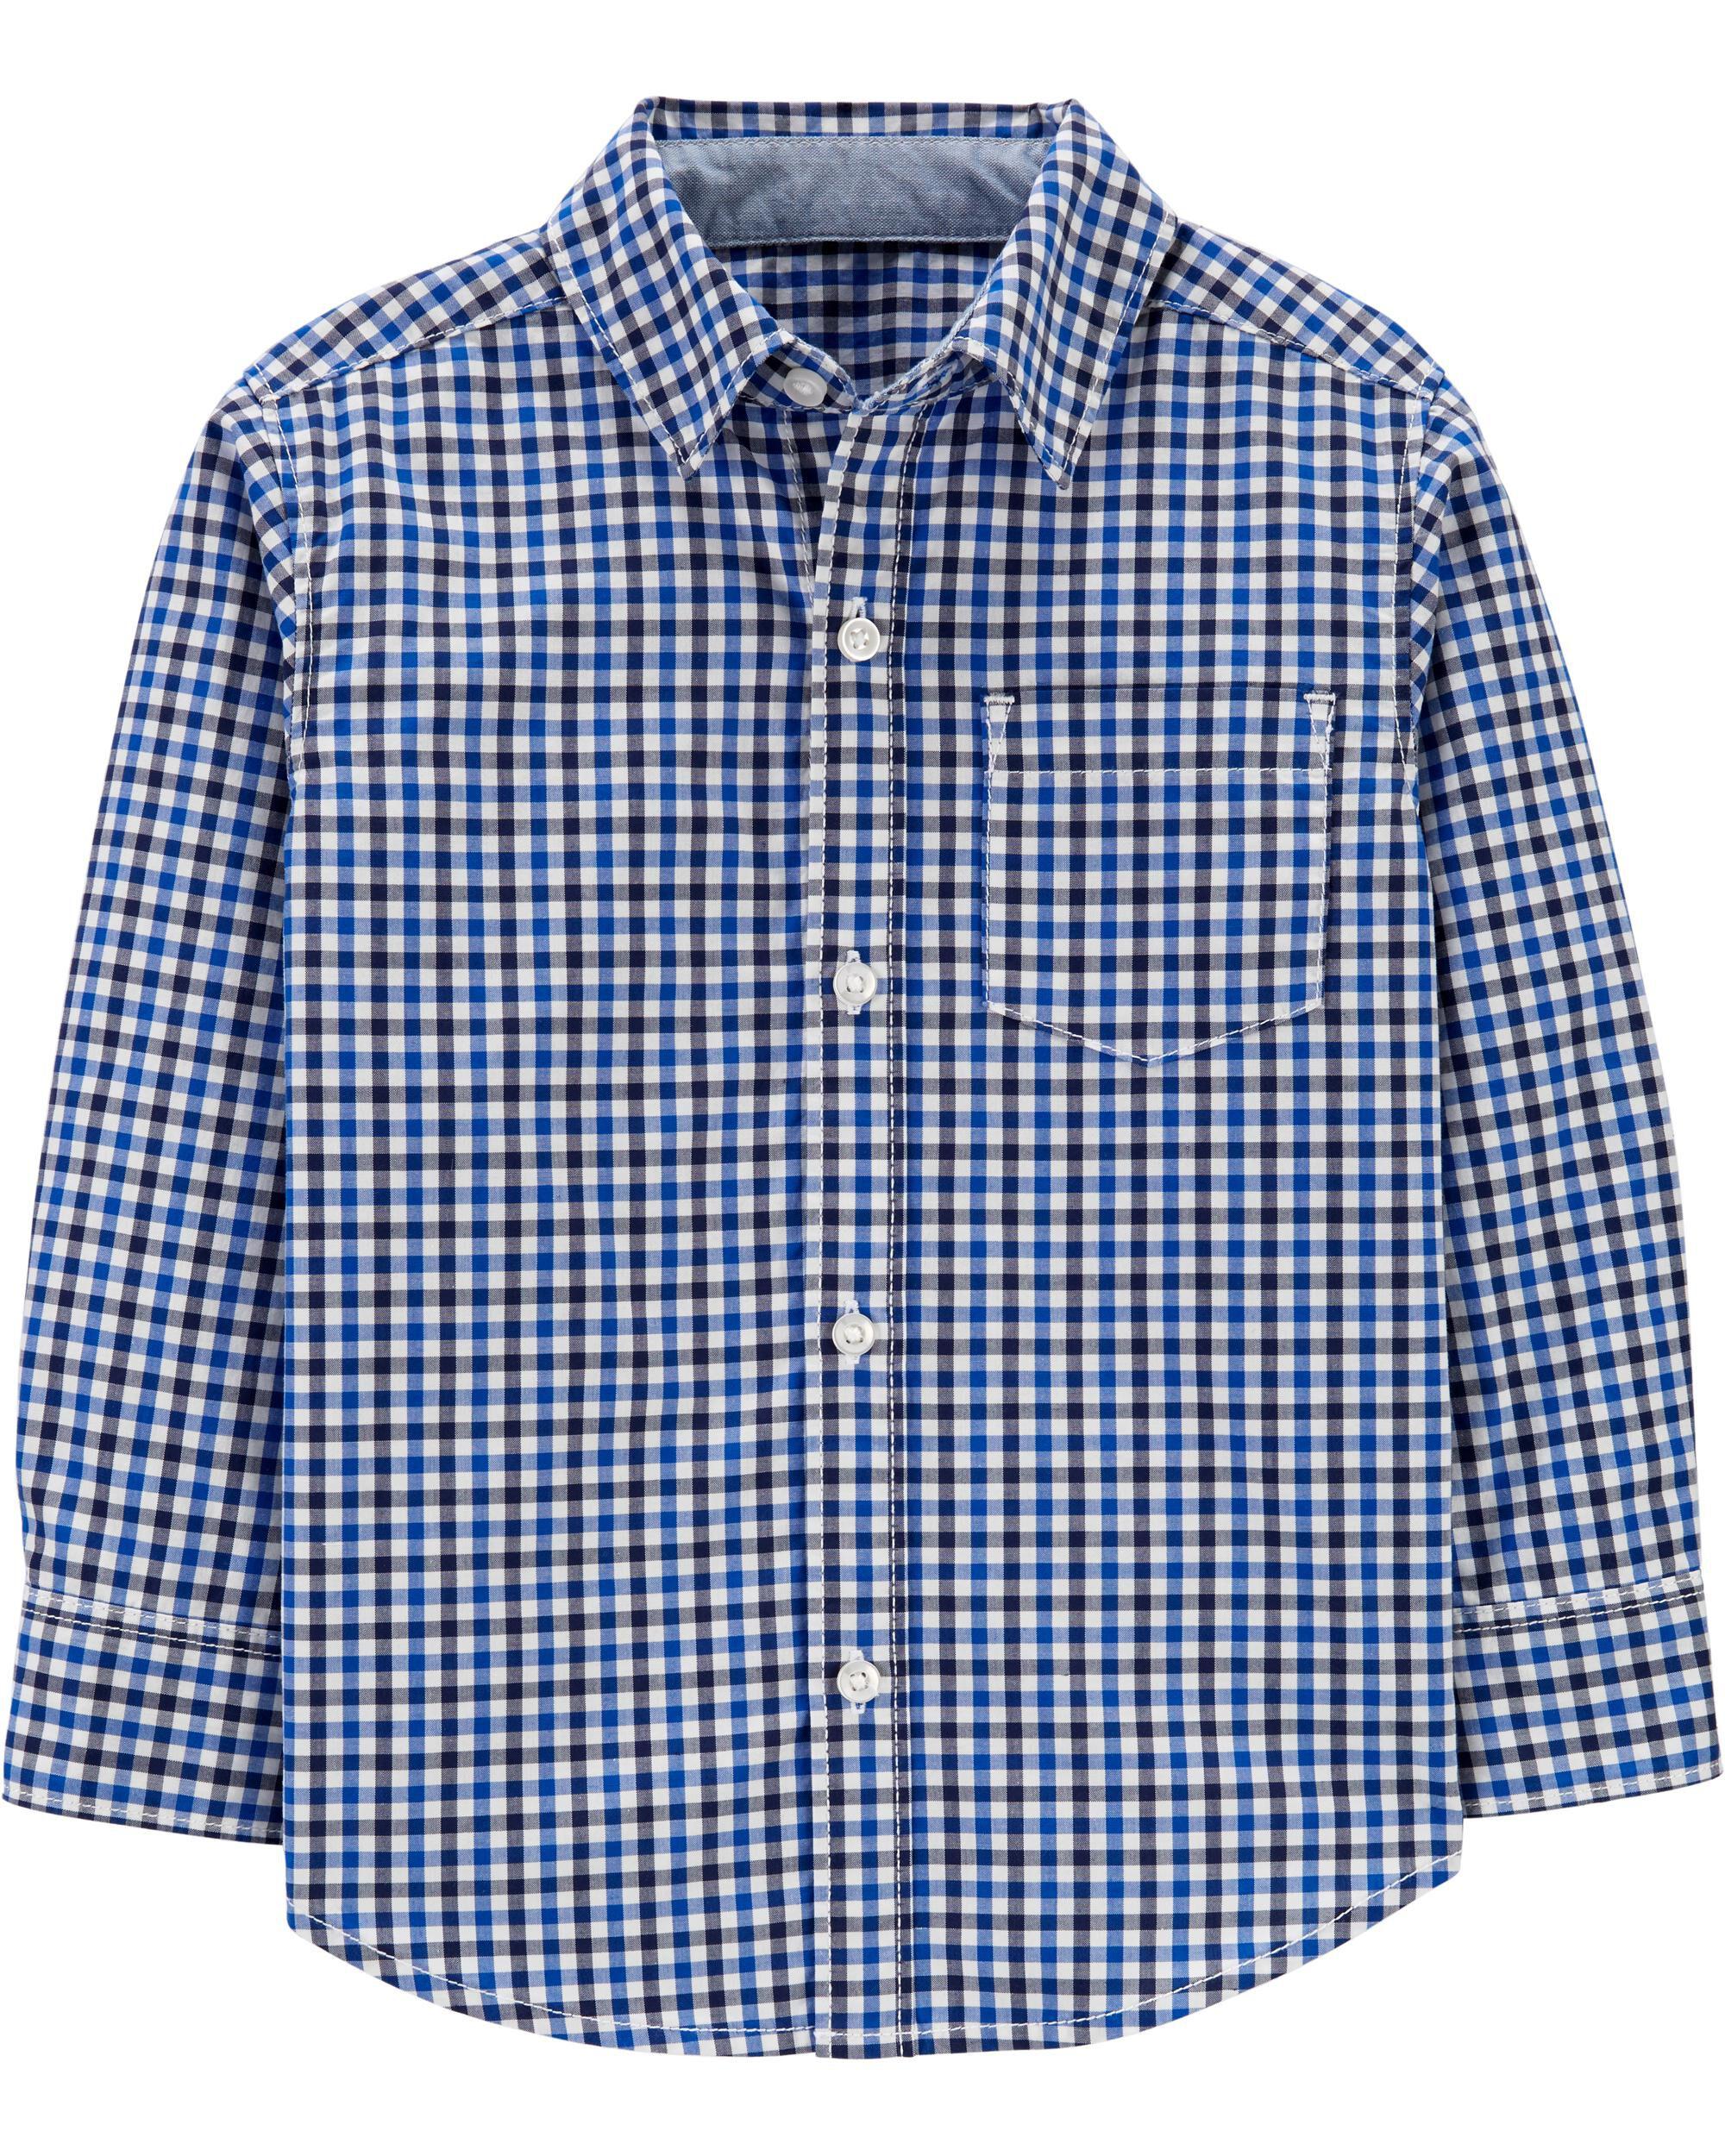 *Clearance*  Plaid Poplin Button-Front Shirt